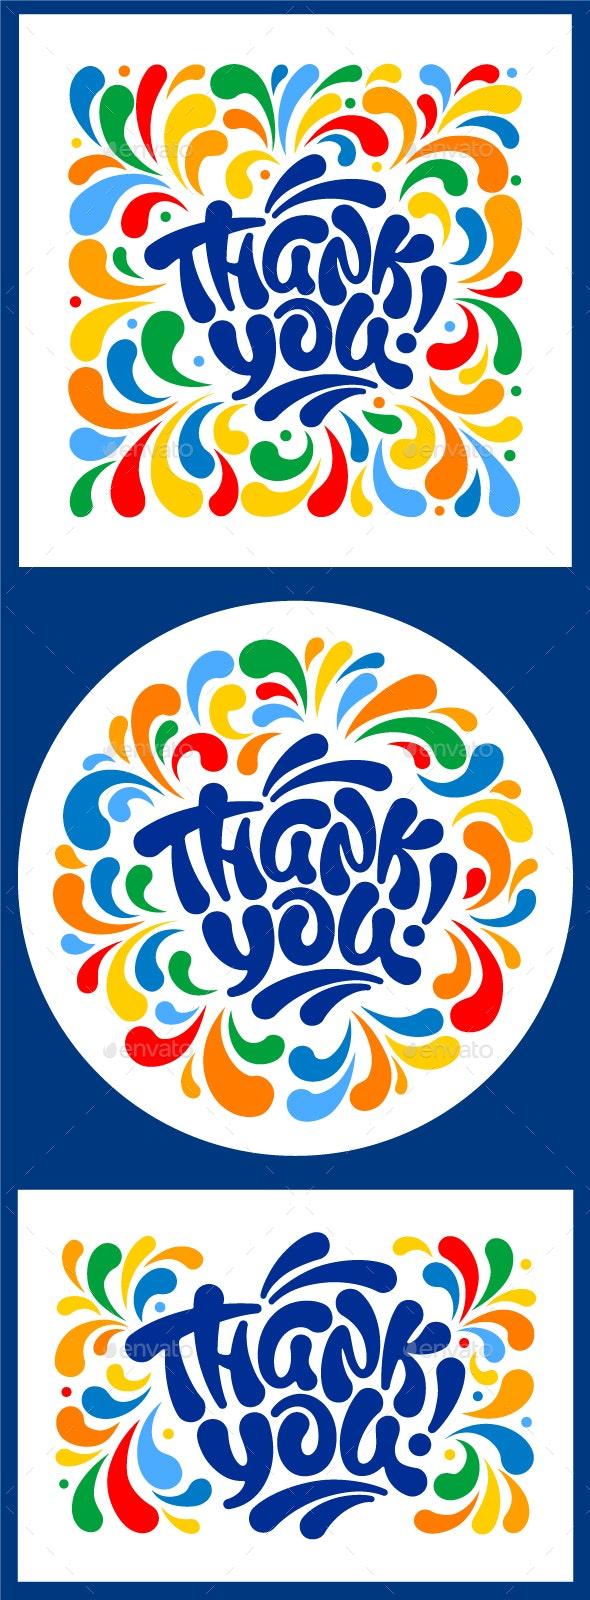 Thank You Designs Set - Decorative Symbols Decorative